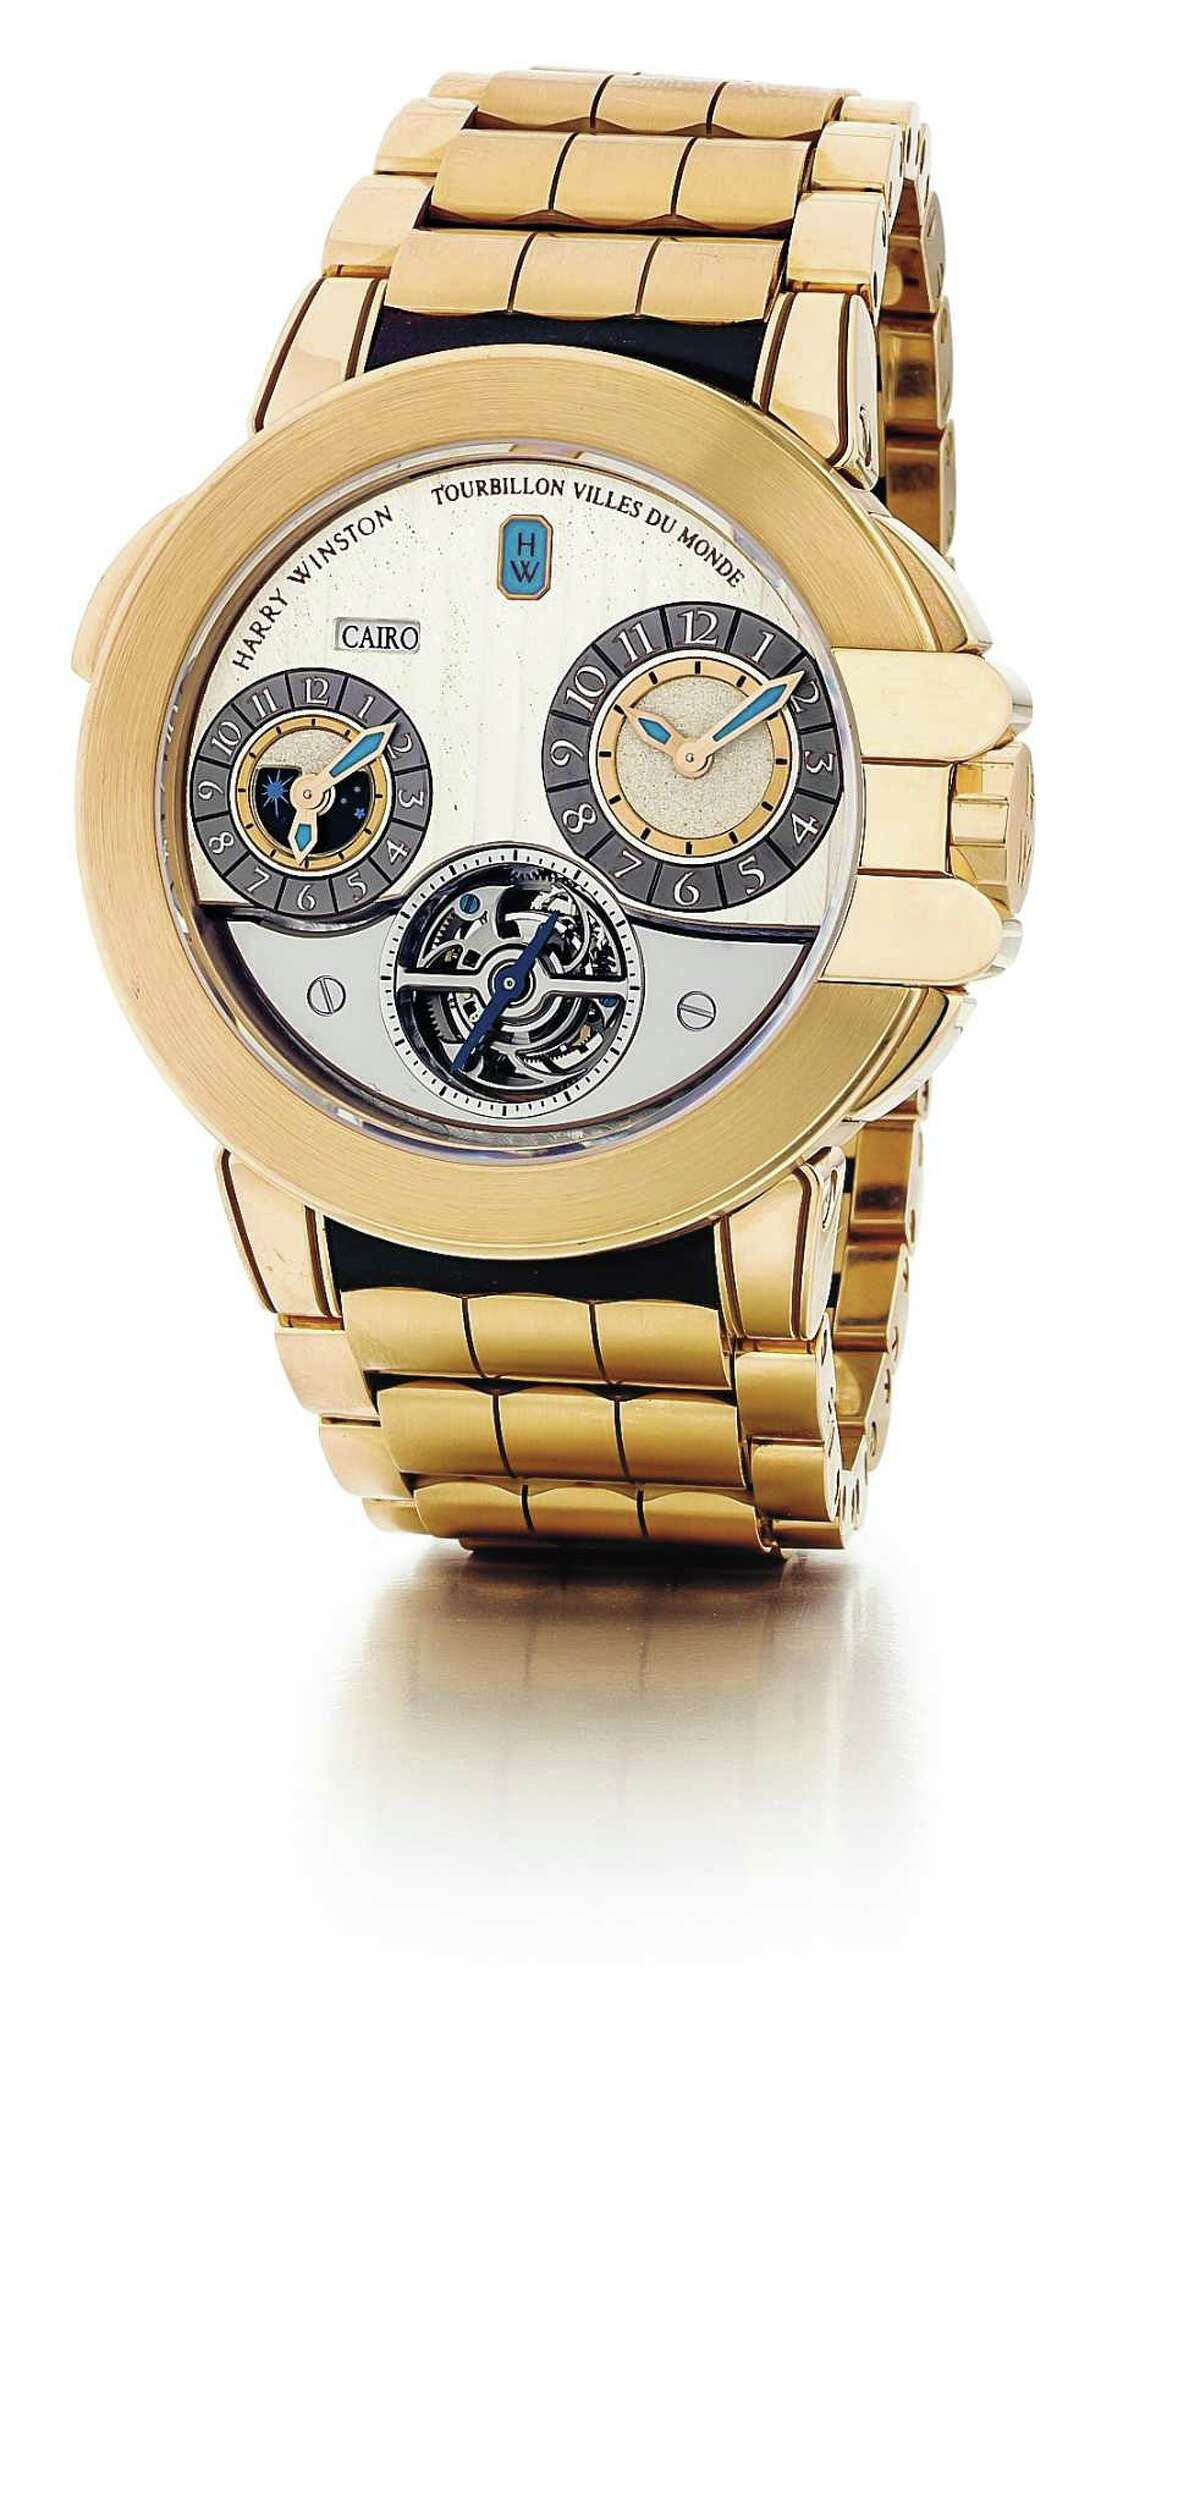 Harry Winston Ocean Tourbillon GMT Traveler is available at Tenenbaum Jewelers in Houston.